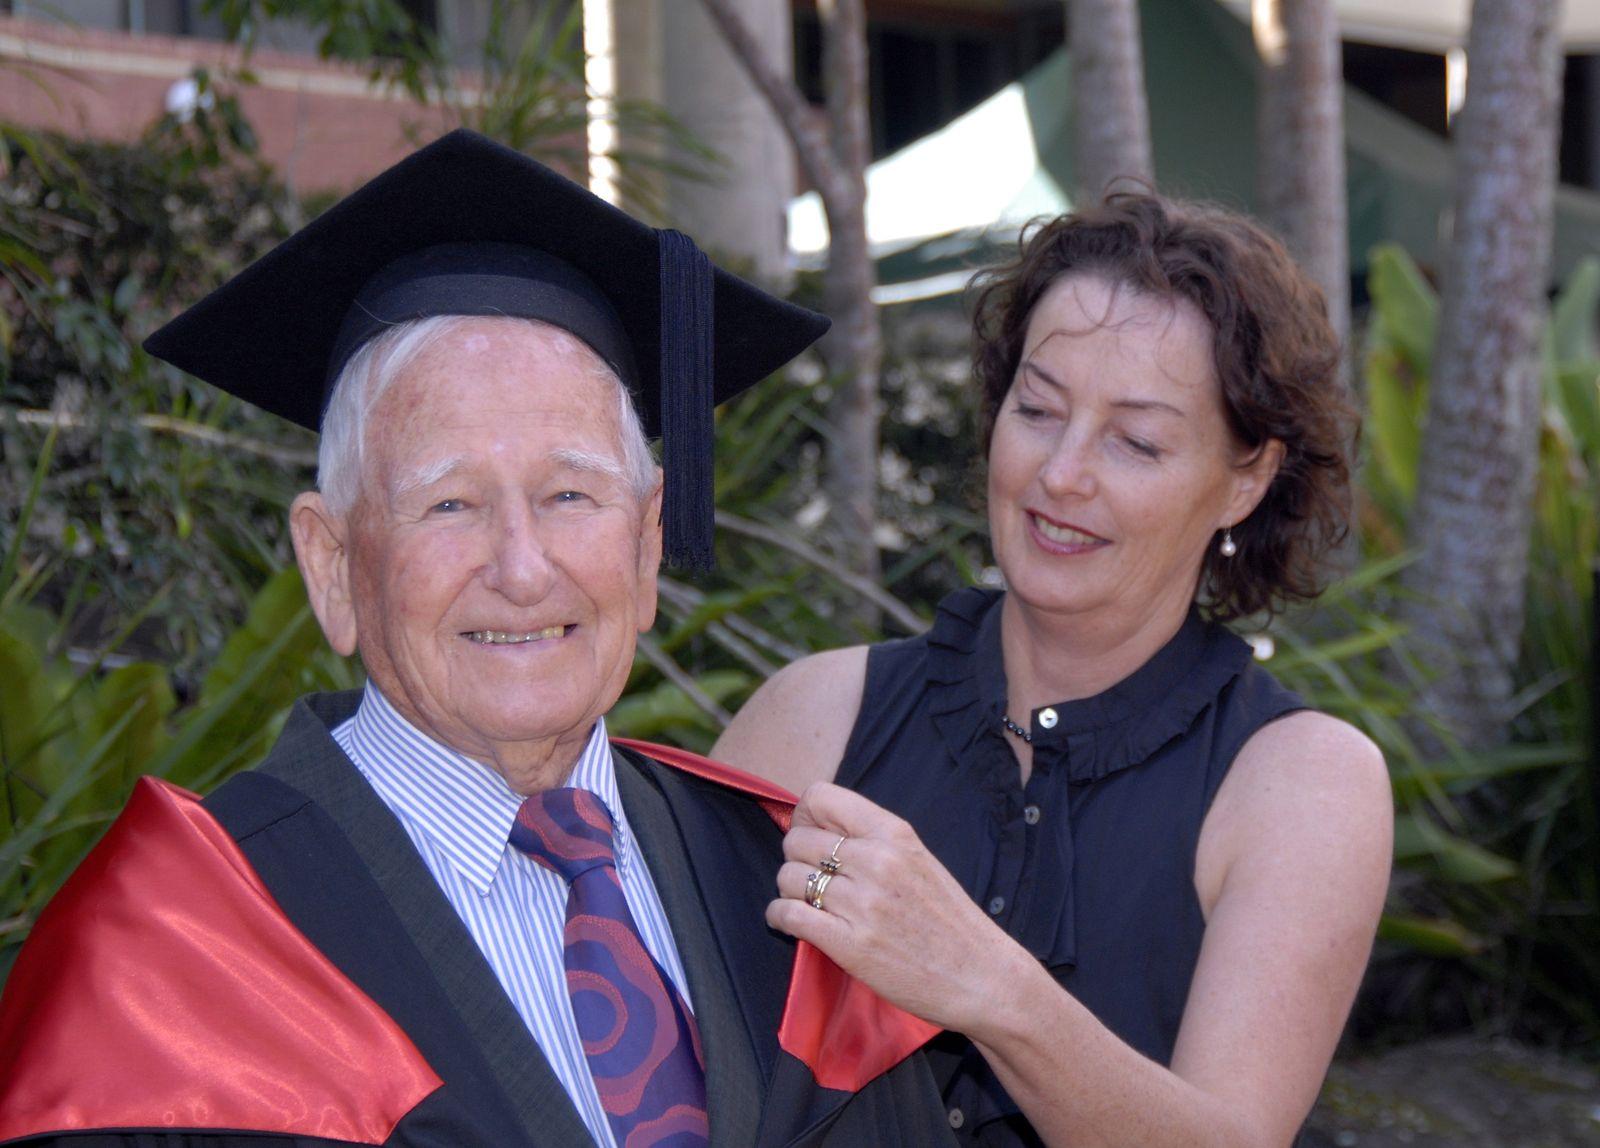 Urgroßvater / Master-Abschluss /Australien